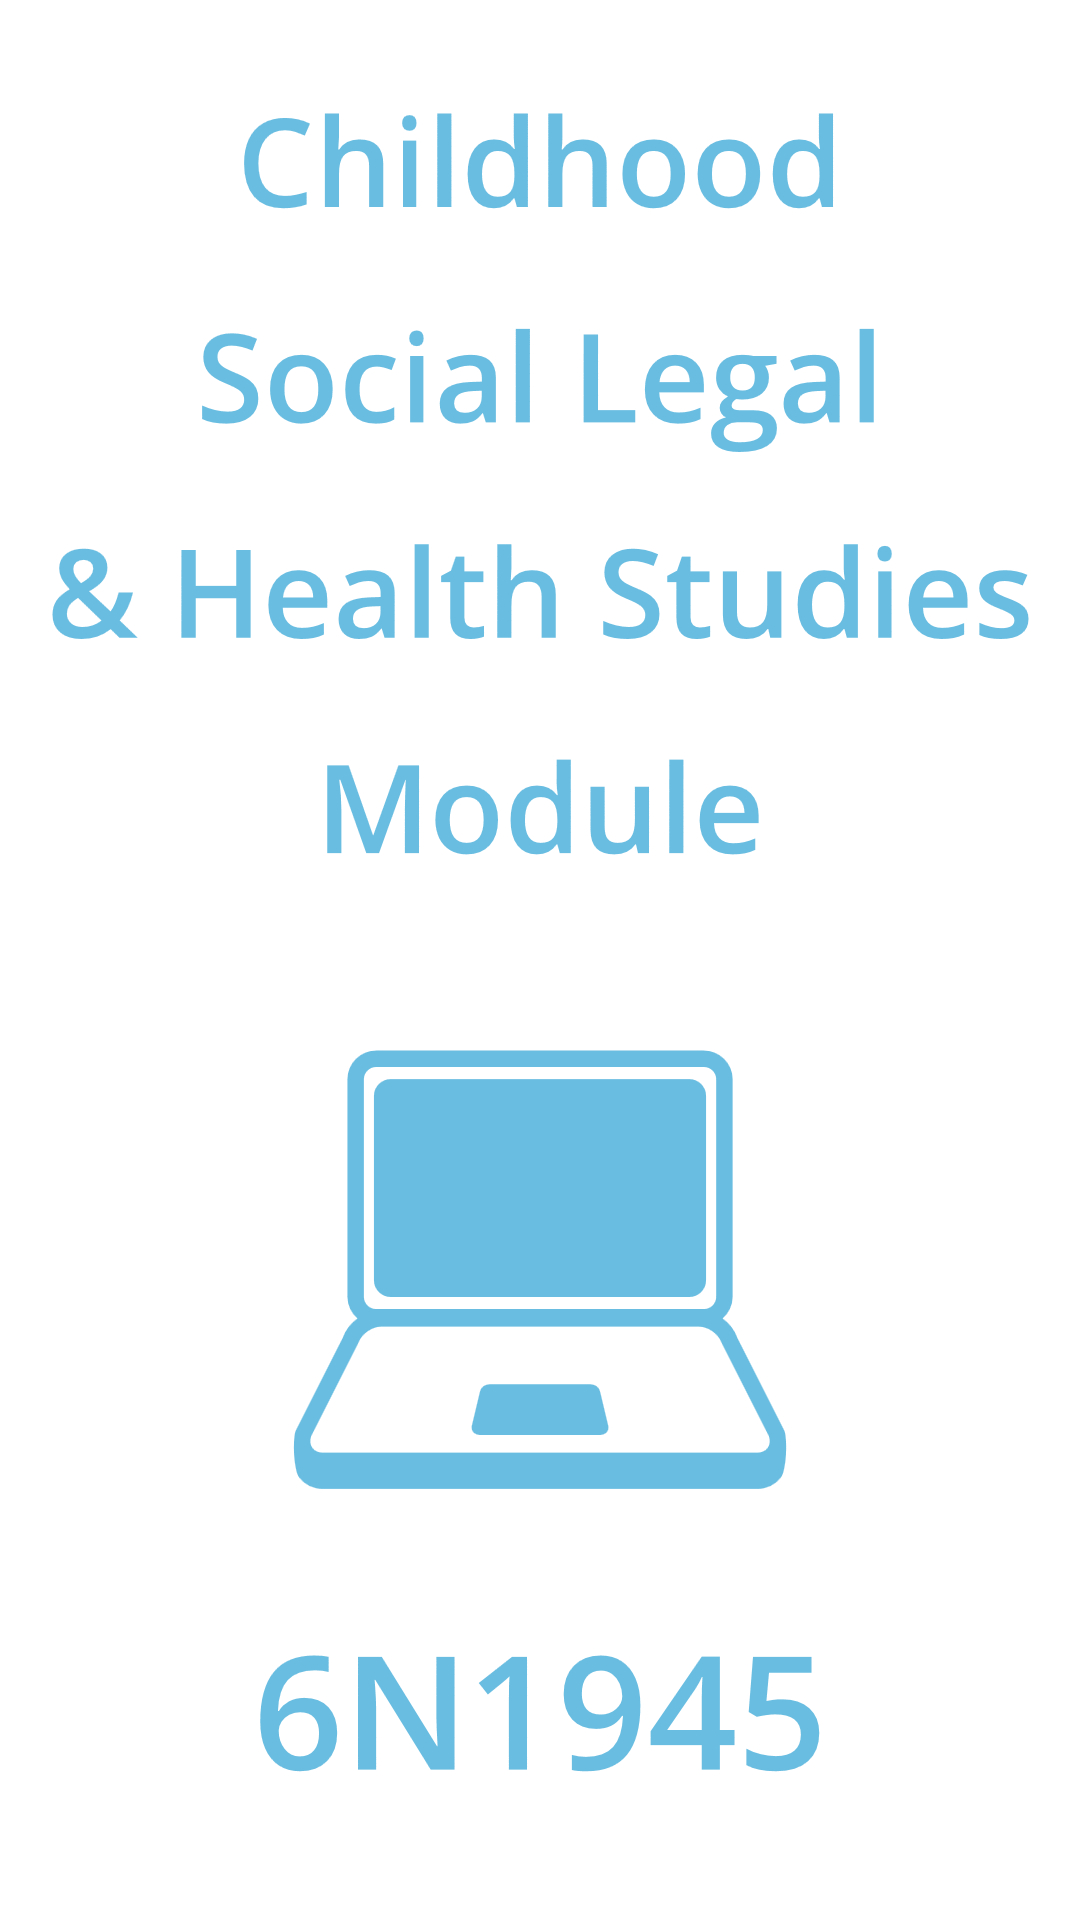 Childhood Social Legal & Health Studies